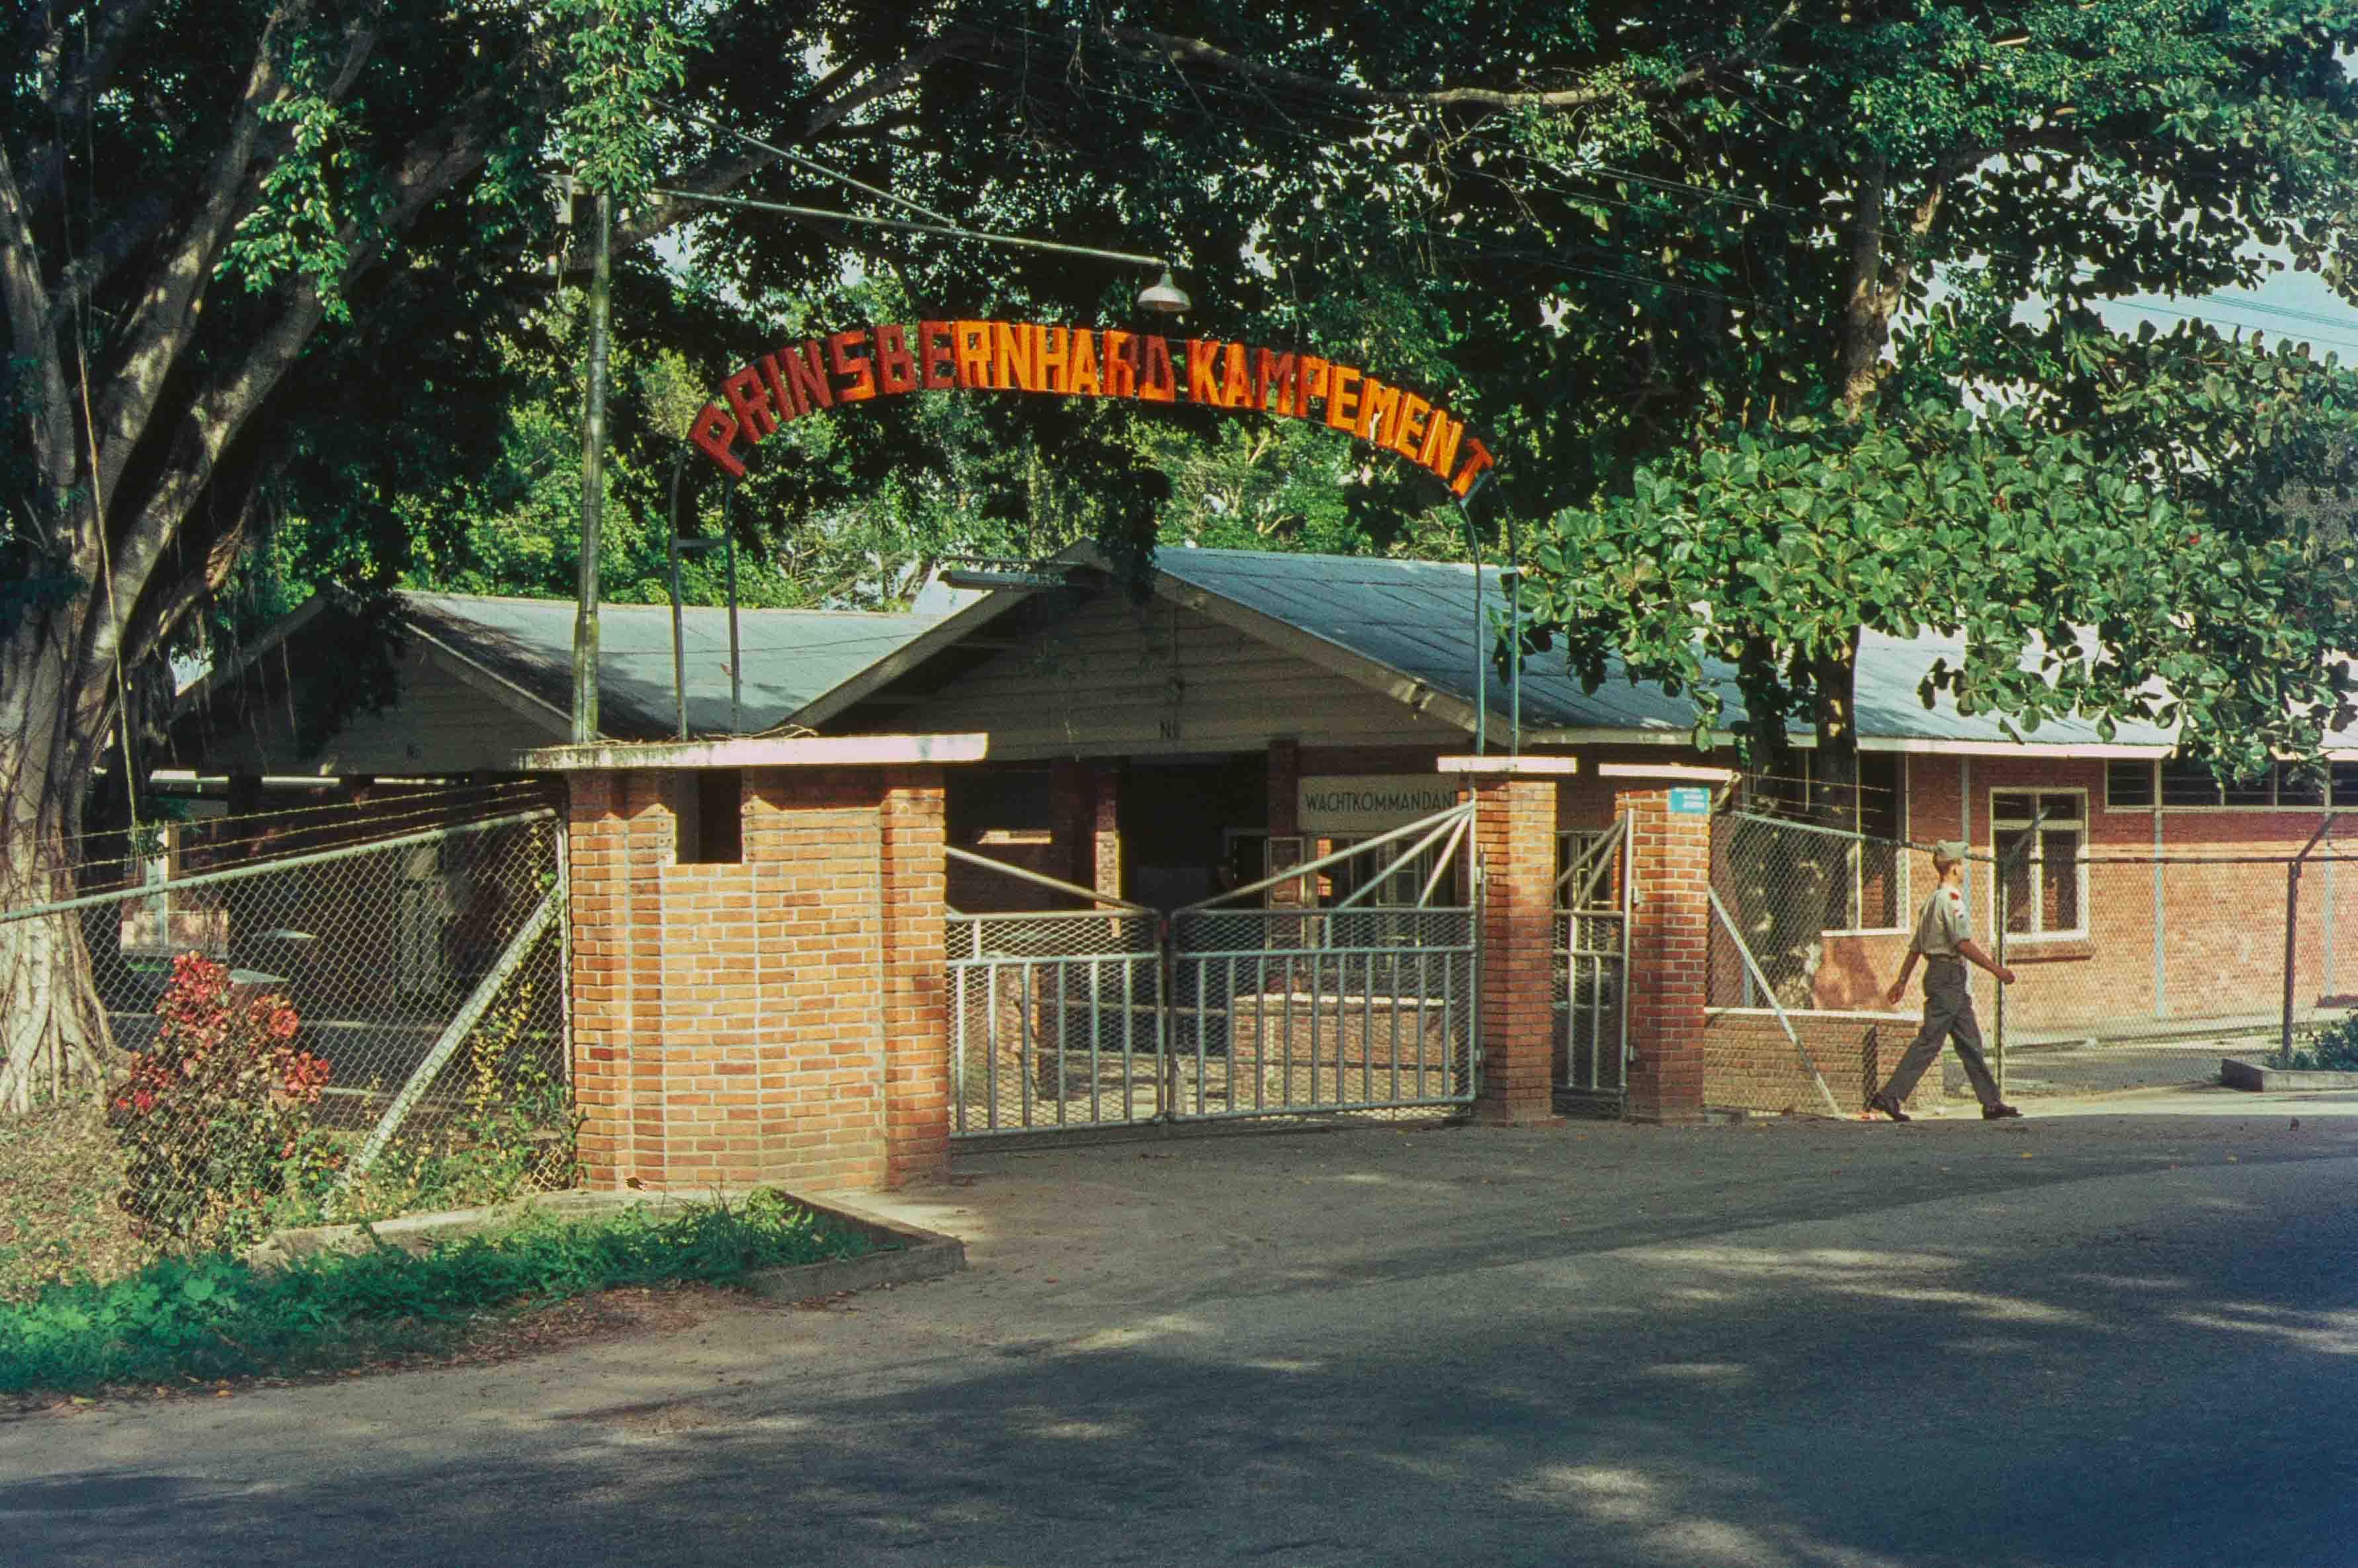 282. Suriname